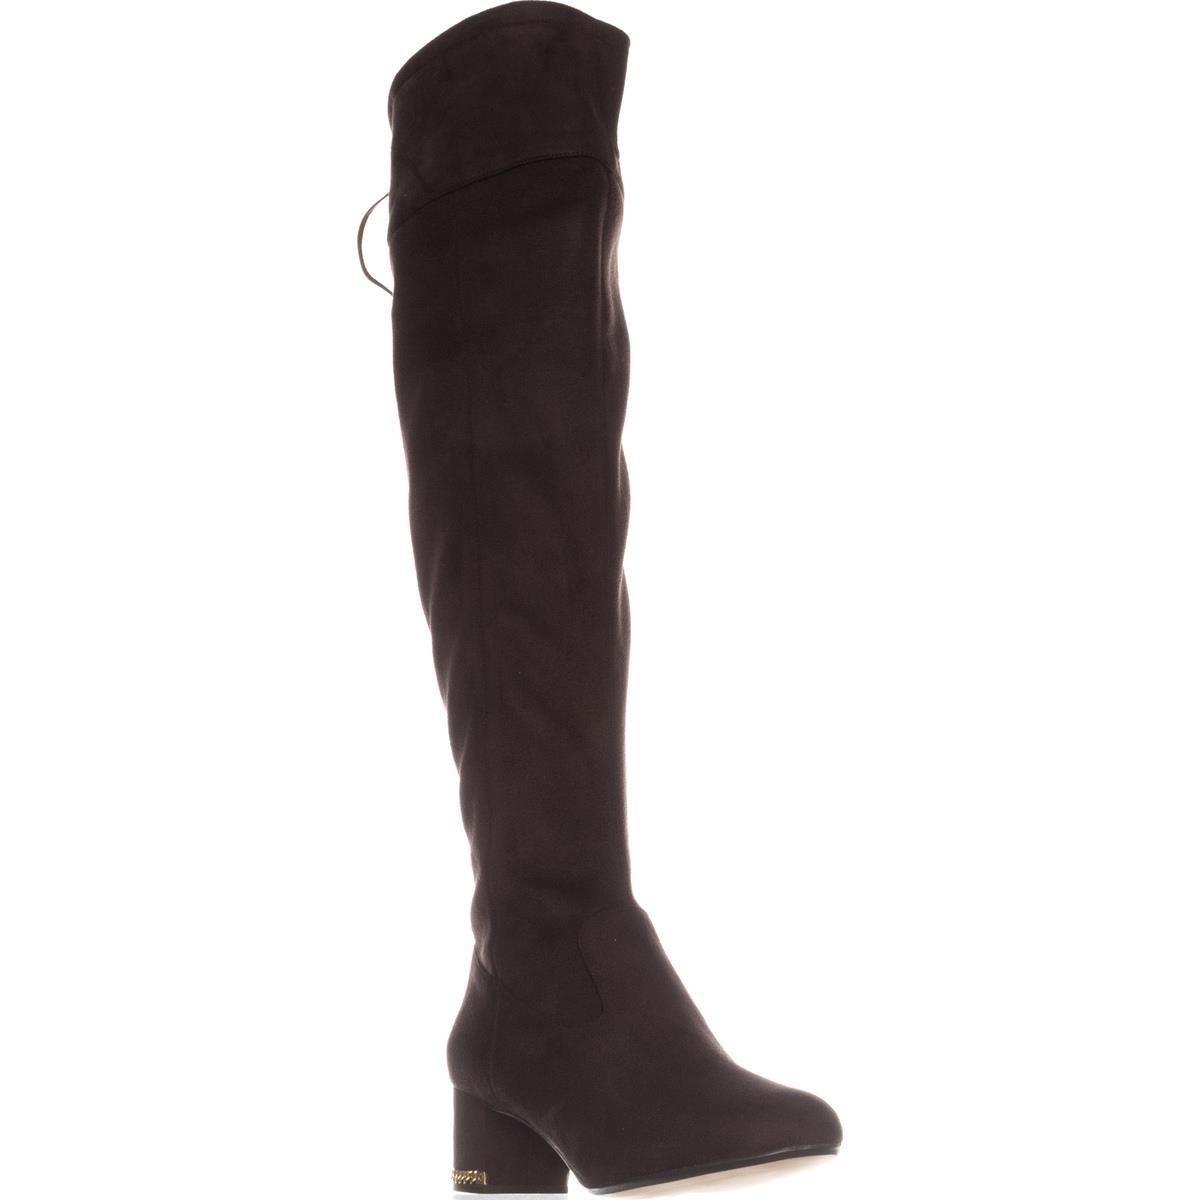 f57ee696b01 Michael Kors Womens Jamie Suede Almond Toe Over Knee Fashion Boots ...